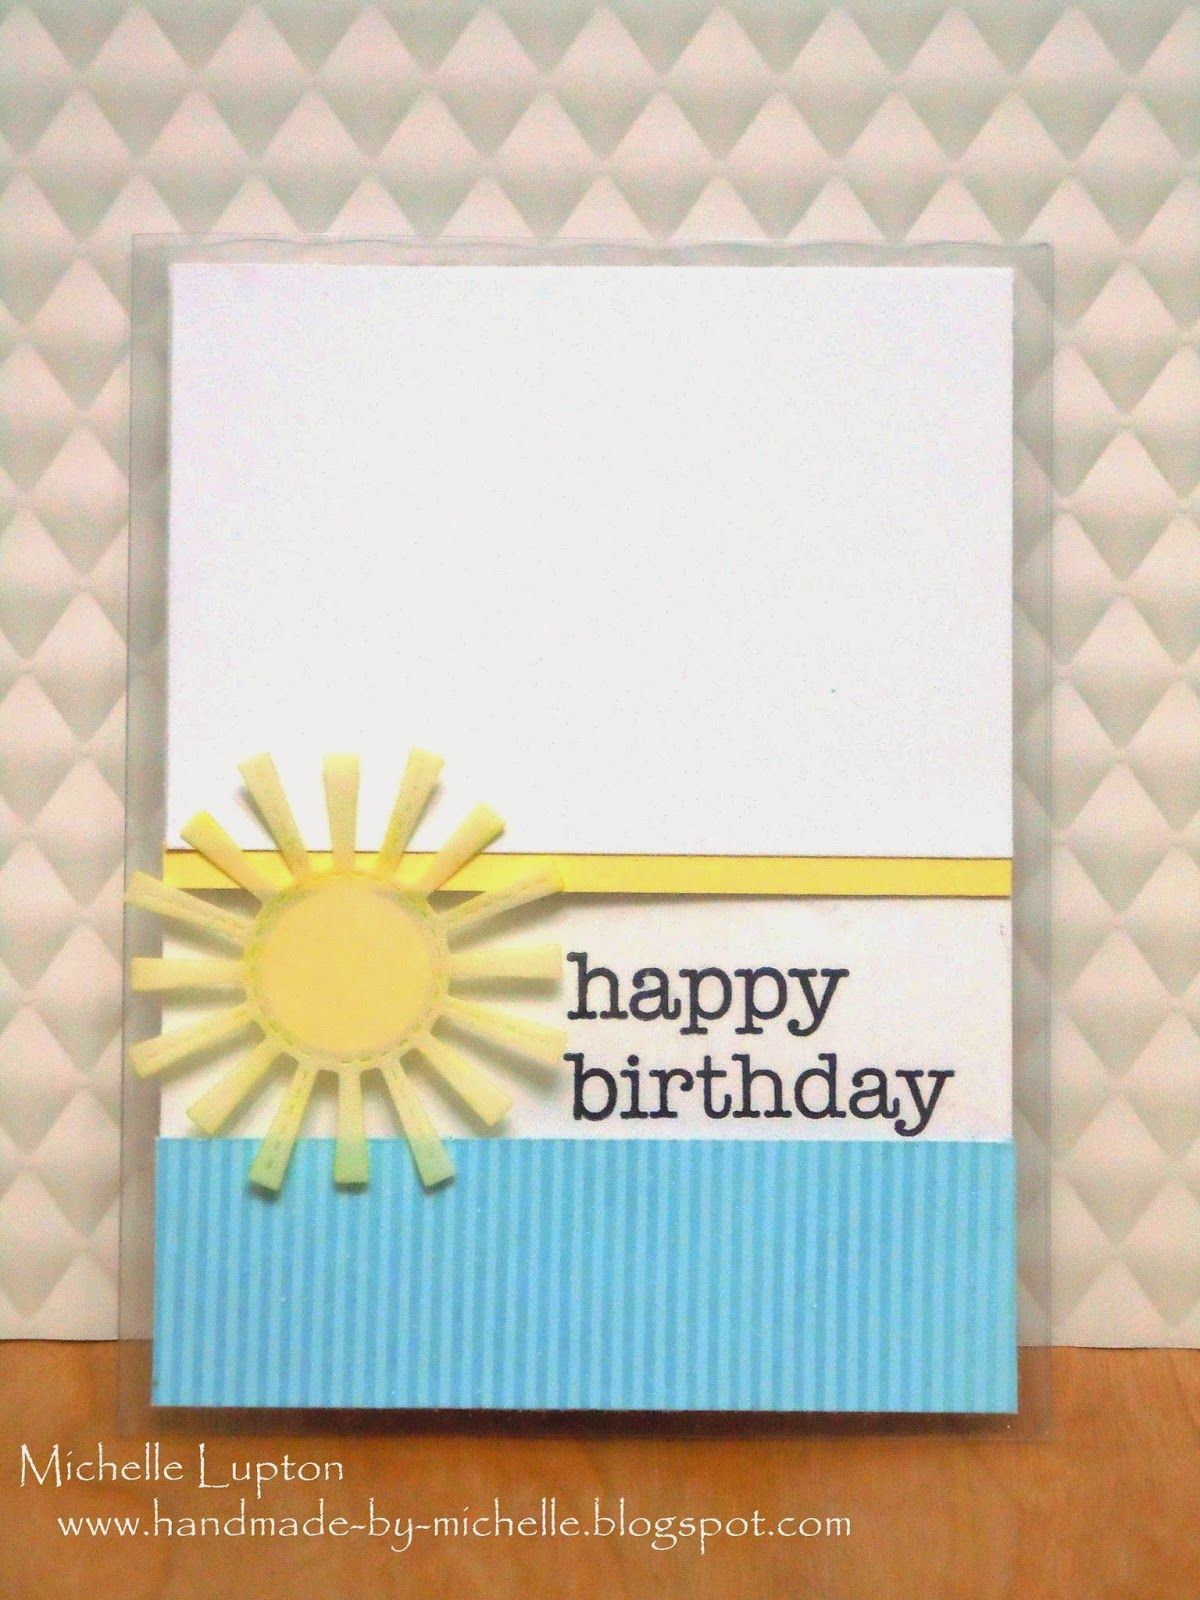 Fusion 16 Happy birthday michelle, Handmade, Window cards